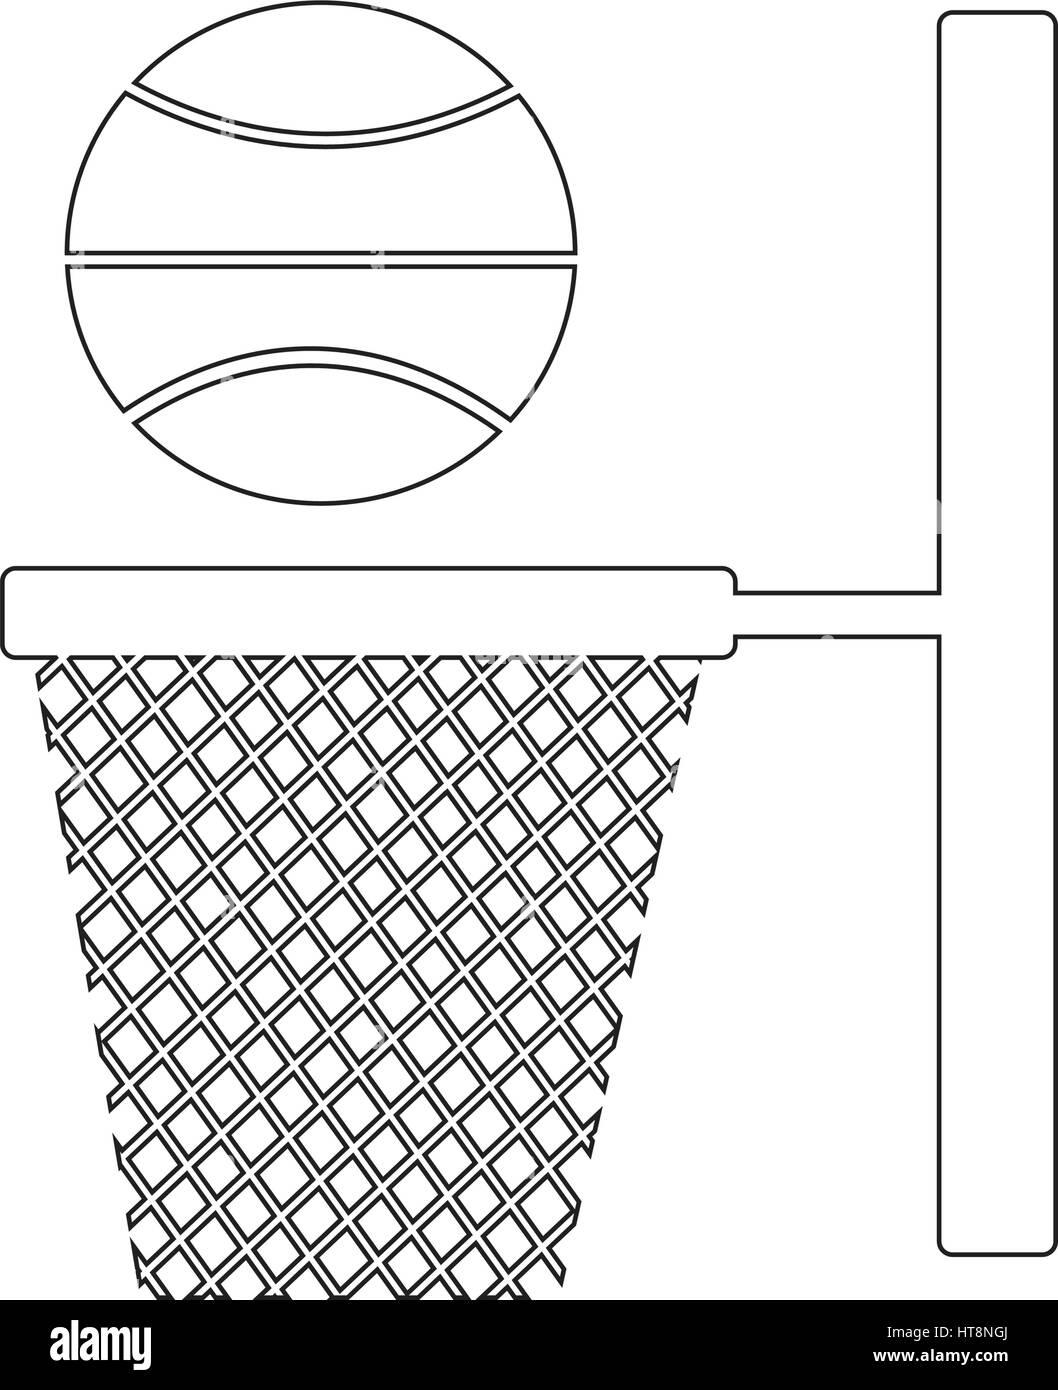 Basketball Hoop And Backboard Black White Stock Photos Images Diagram Net Icon Illustration Design Image